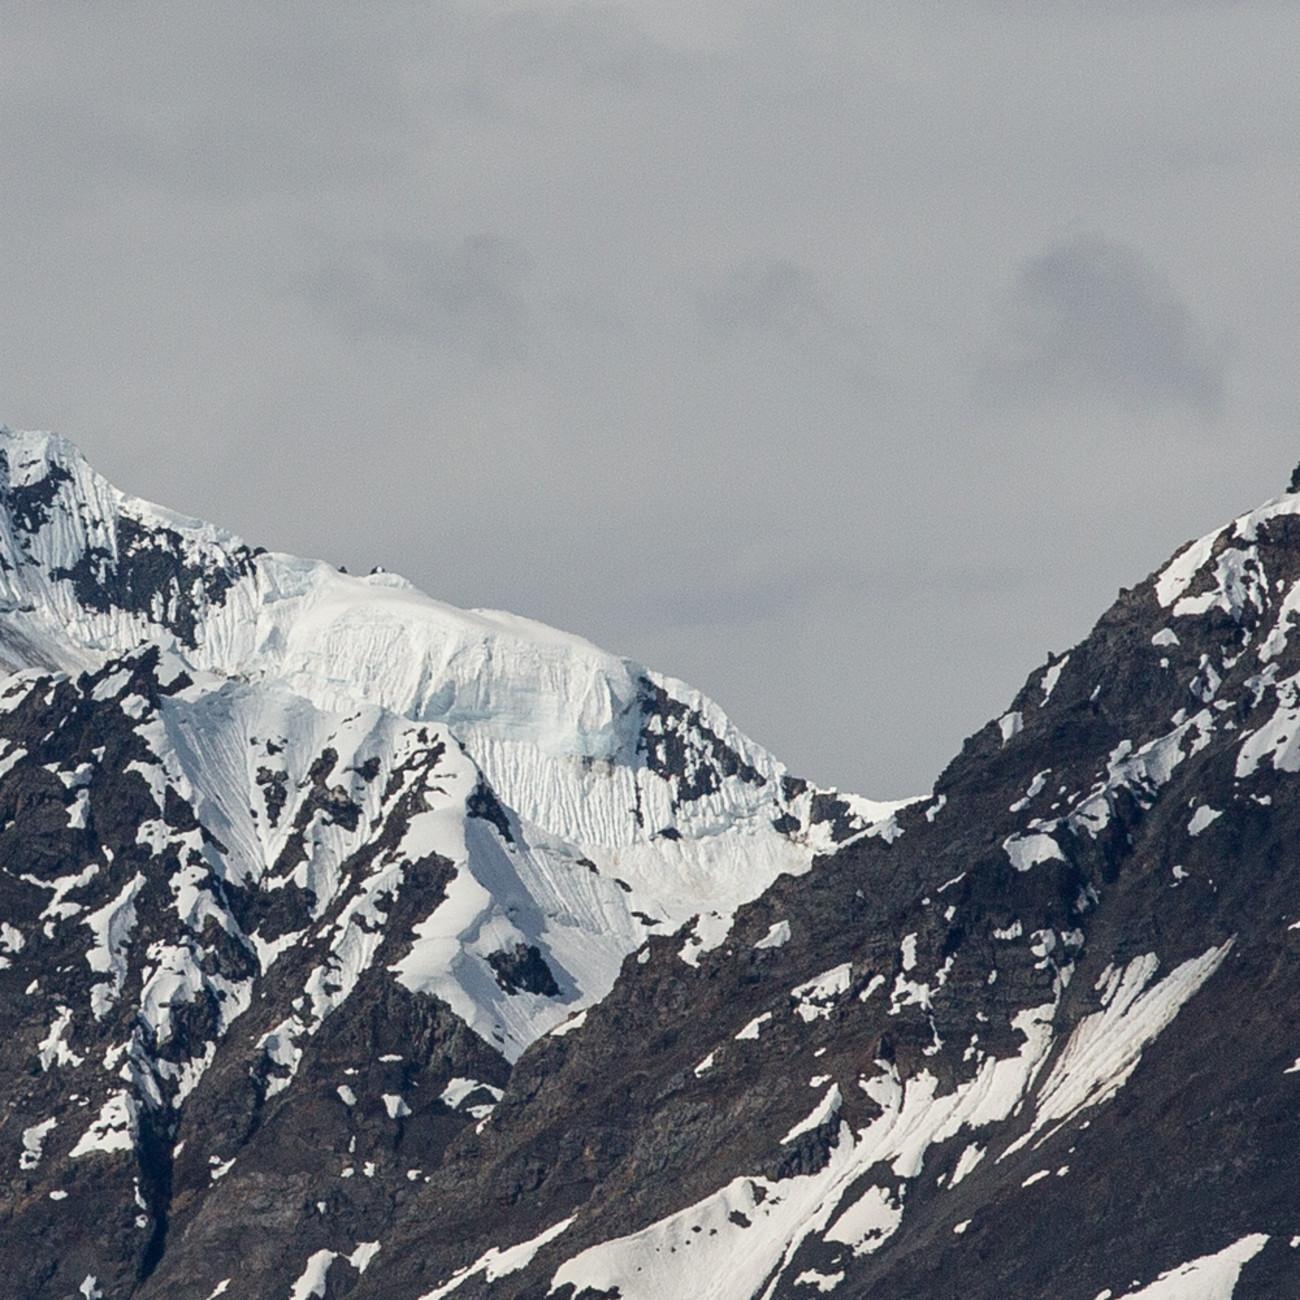 Glacier peaks qp6skv